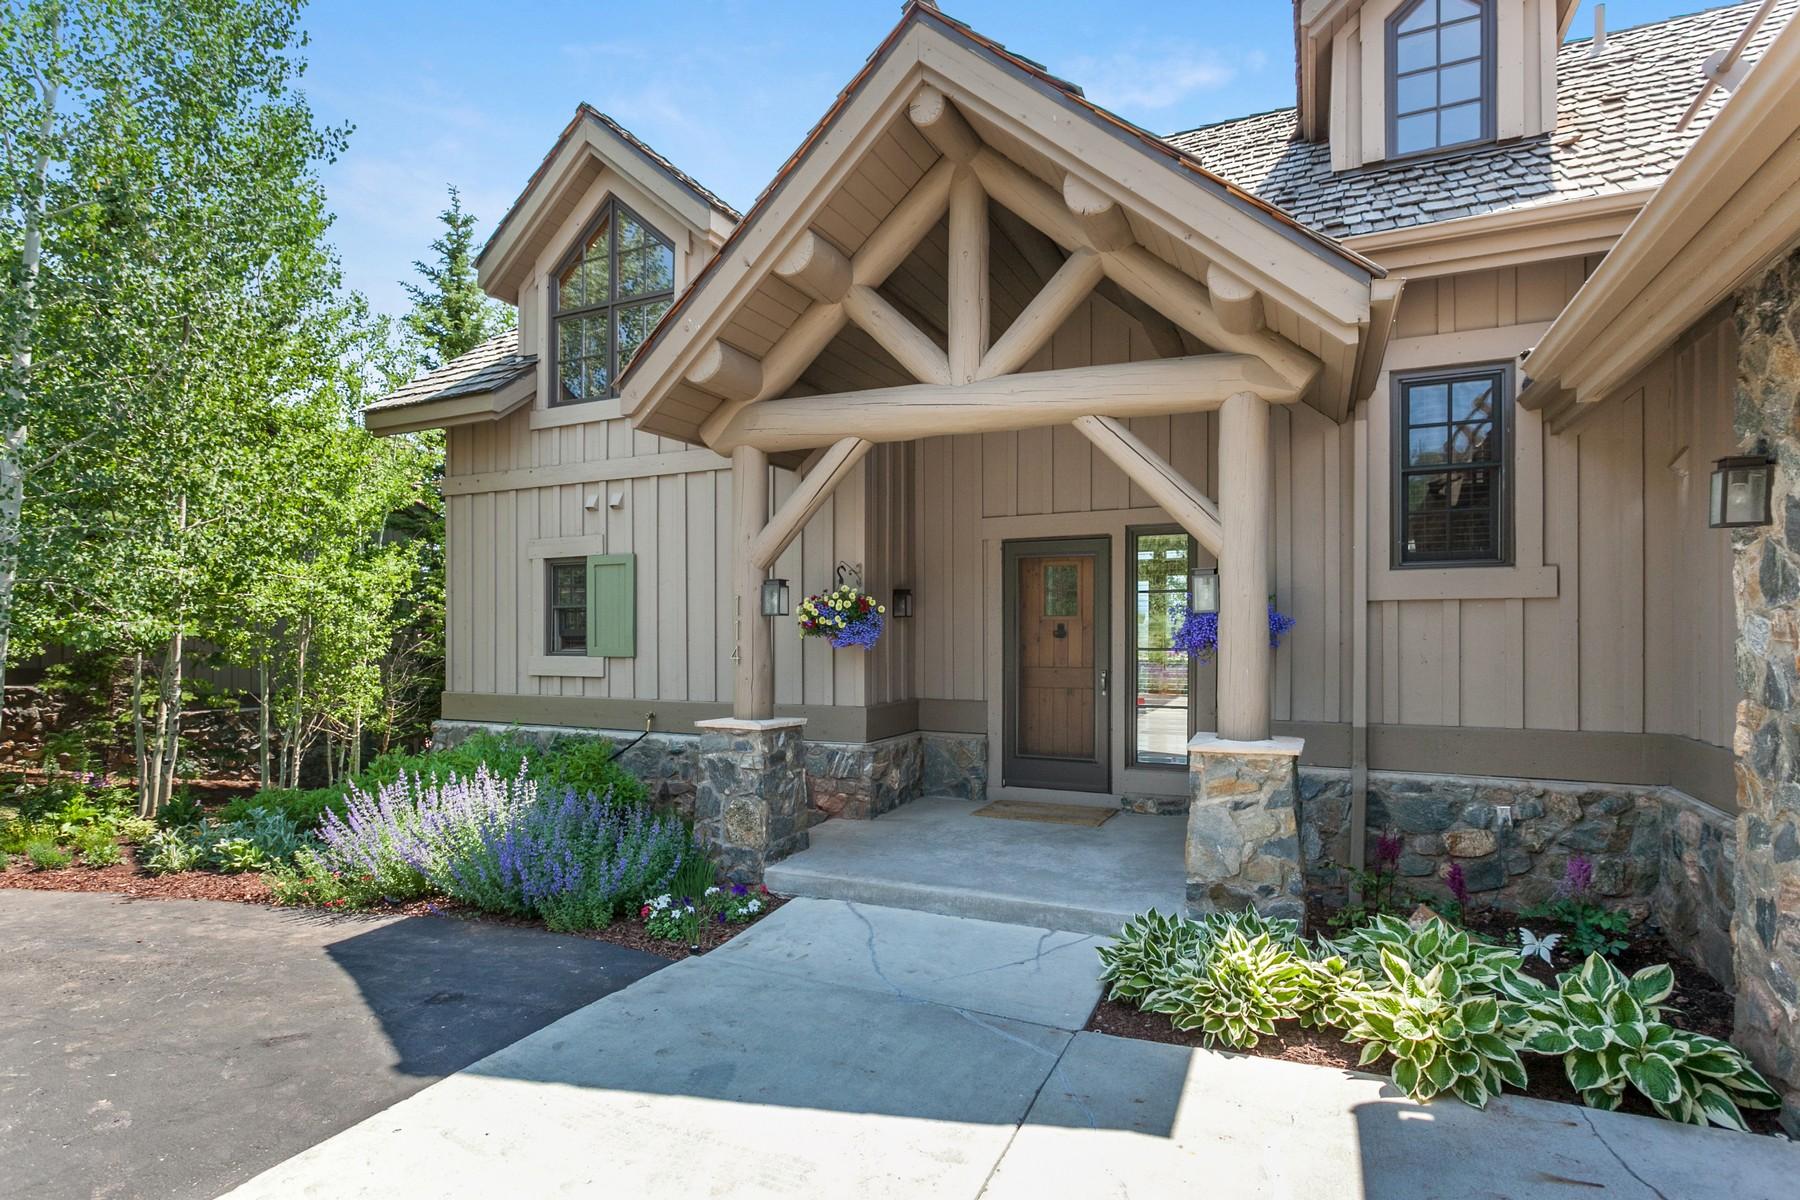 Single Family Home for Active at Cordillera Golf Course Living 114 Bermuda Drive Edwards, Colorado 81632 United States